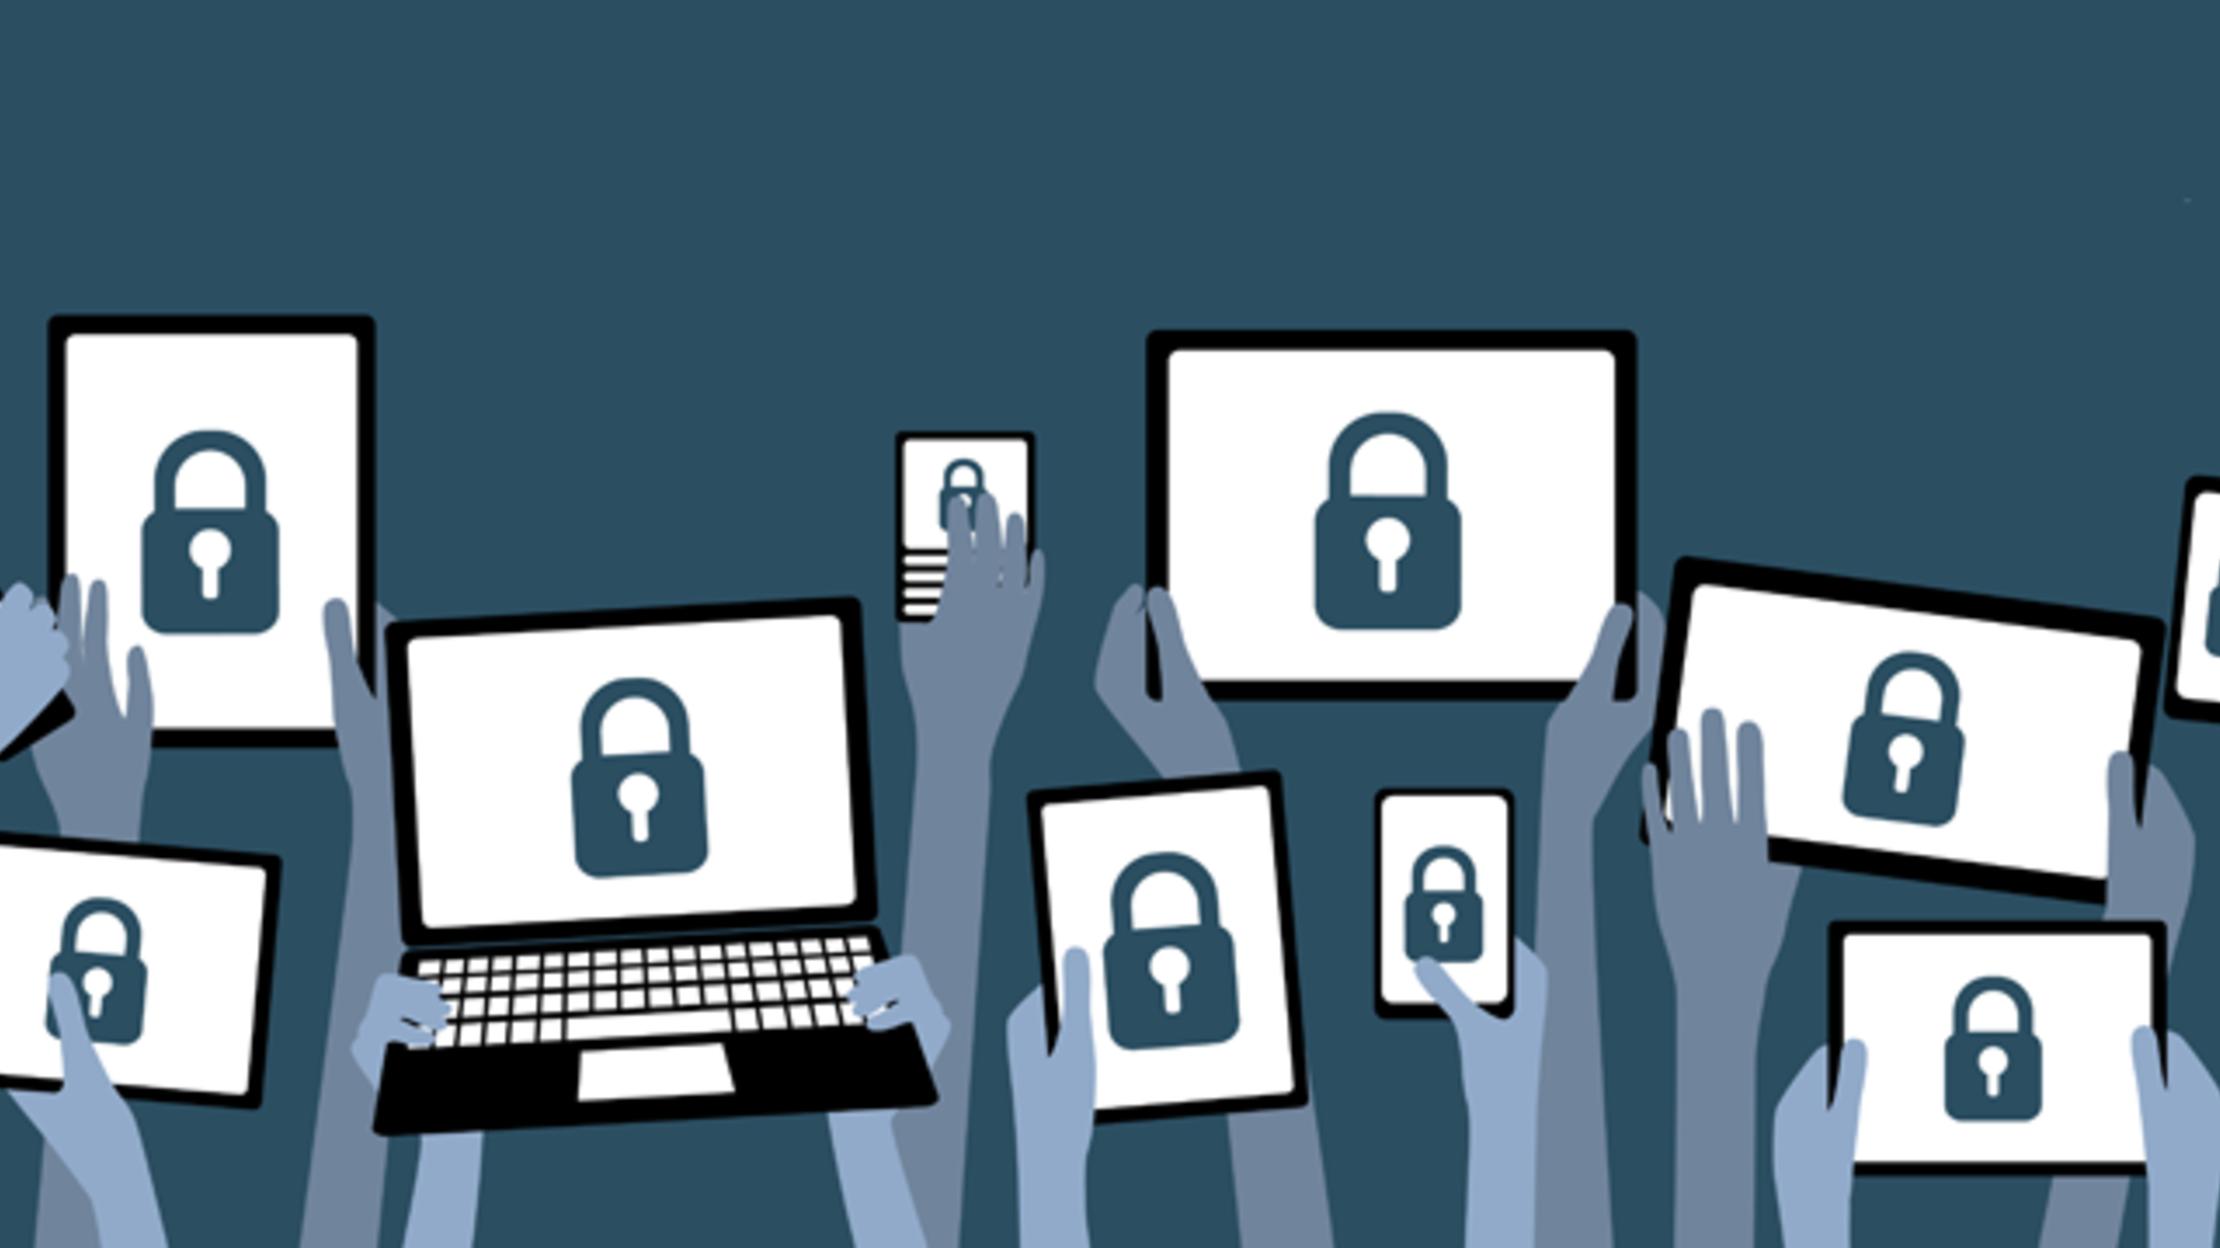 11 Ways Technology Will Keep You Safe   Mental Floss